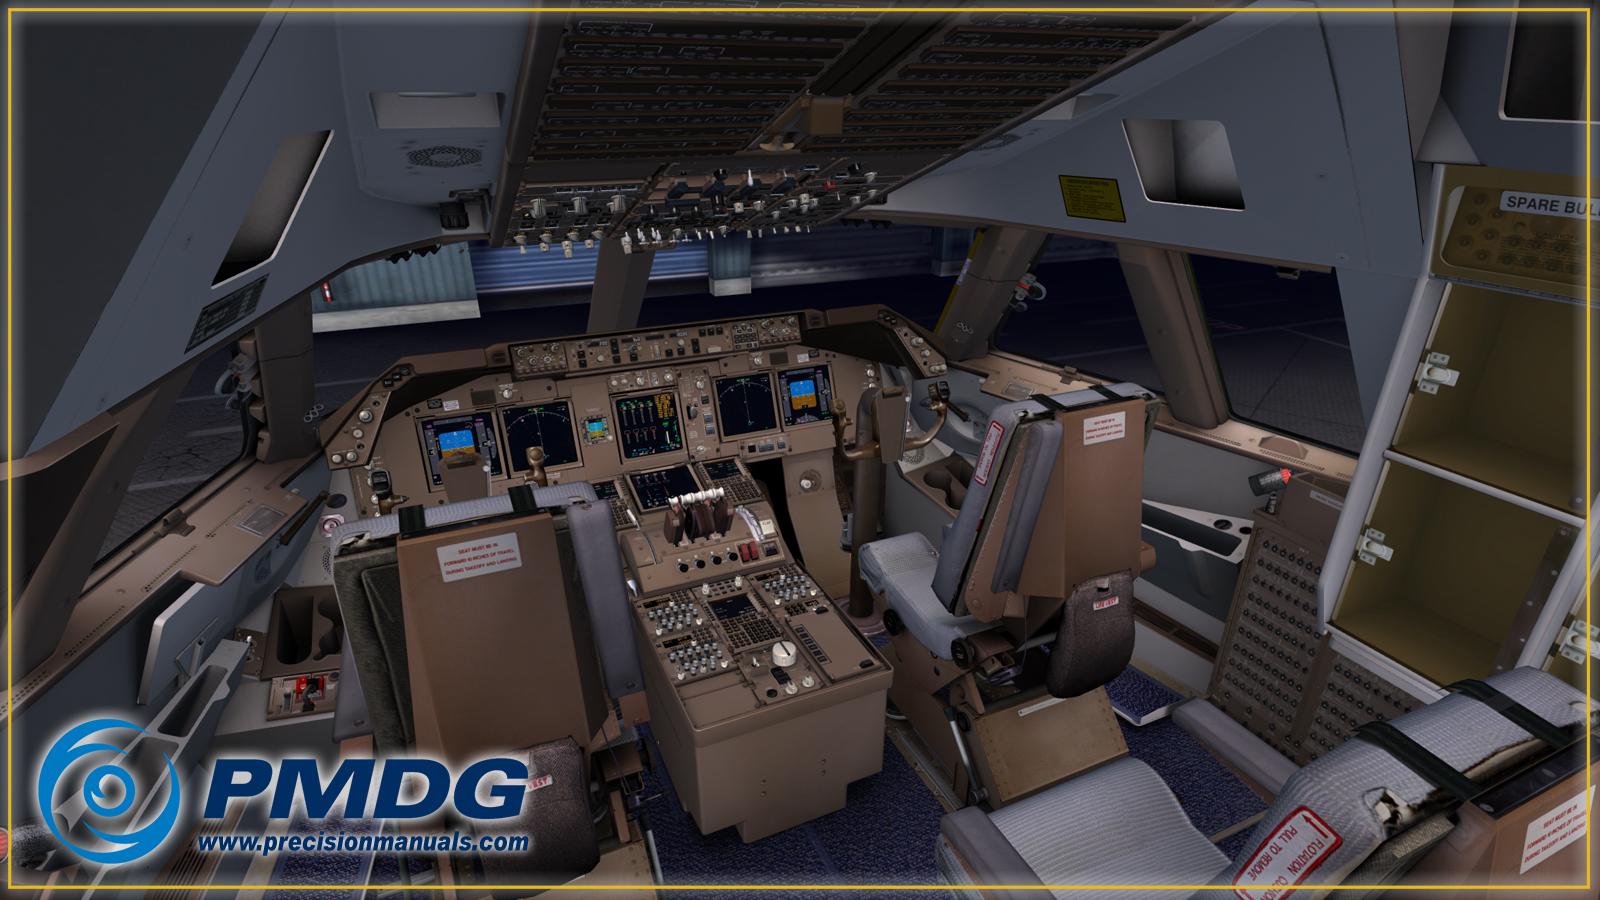 http://downloads.precisionmanuals.com/images/forum/748/2/PMDG_748vc1.jpg